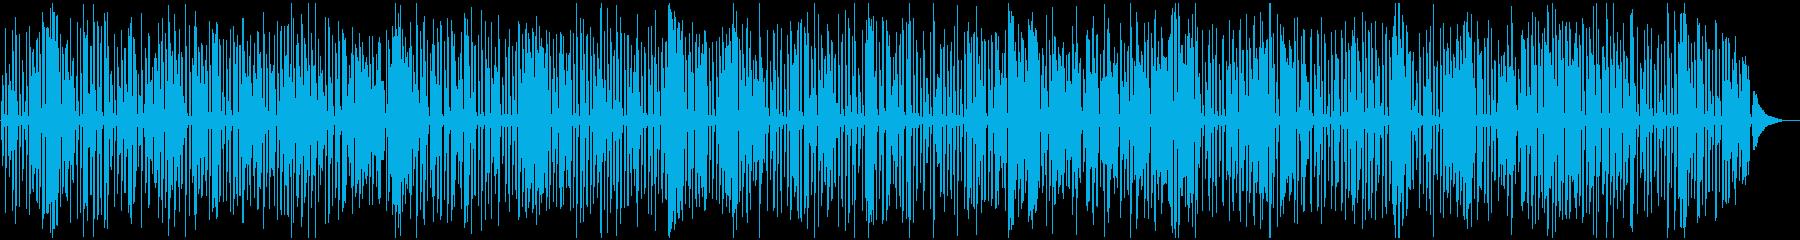 YouTube、楽しいレトロジャズピアノの再生済みの波形